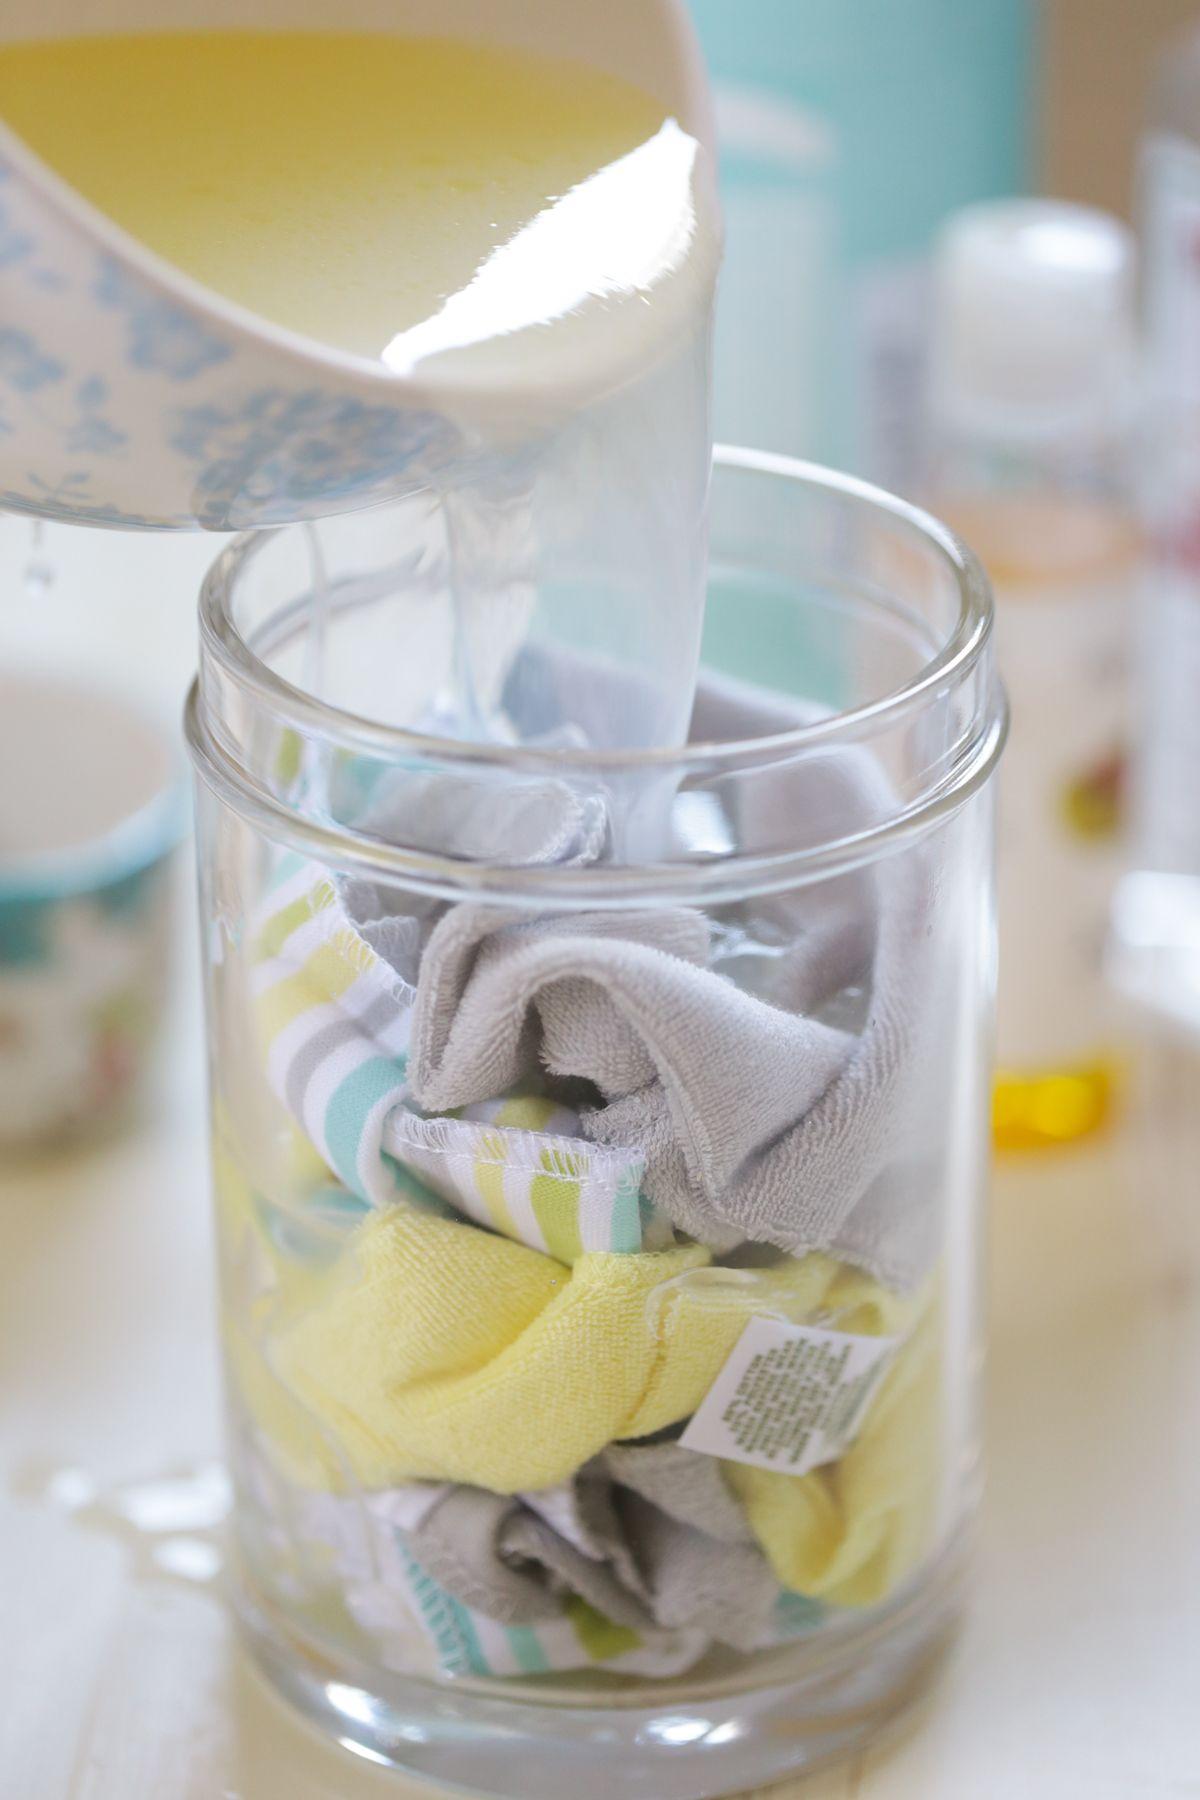 DIY Homemade Reusable Facial Cleansing Wipes Homemade